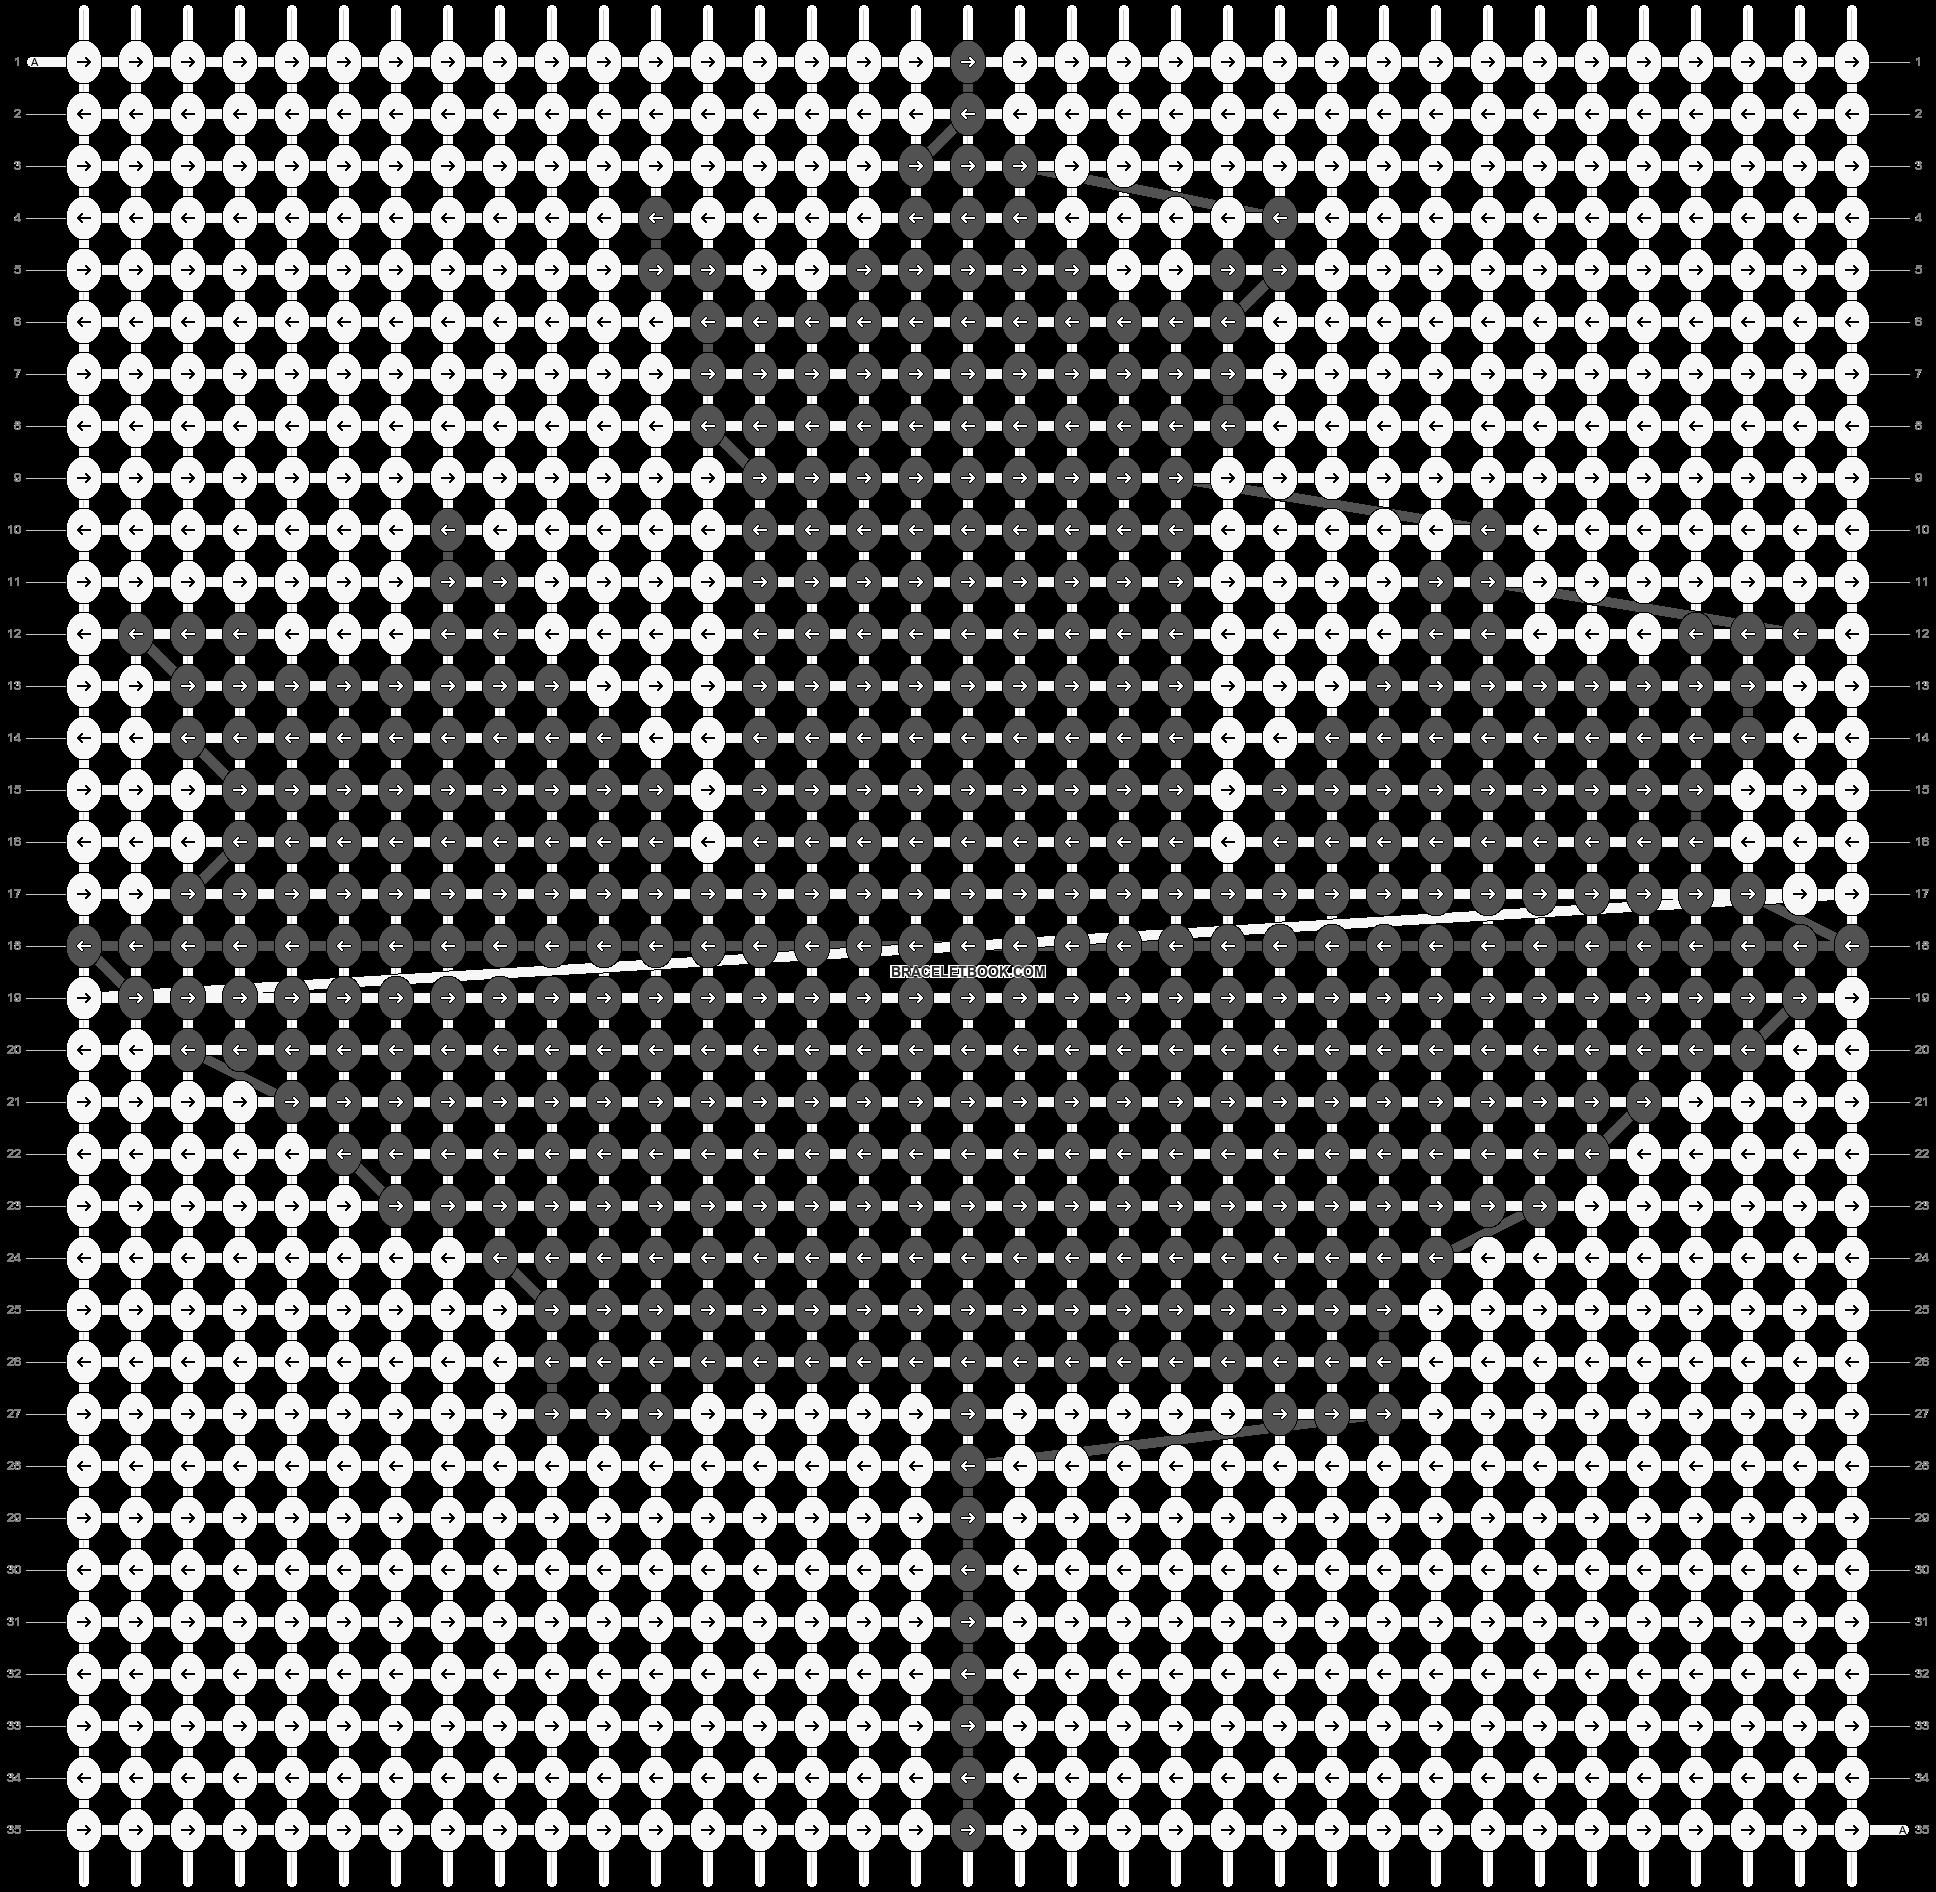 Alpha pattern #657 pattern